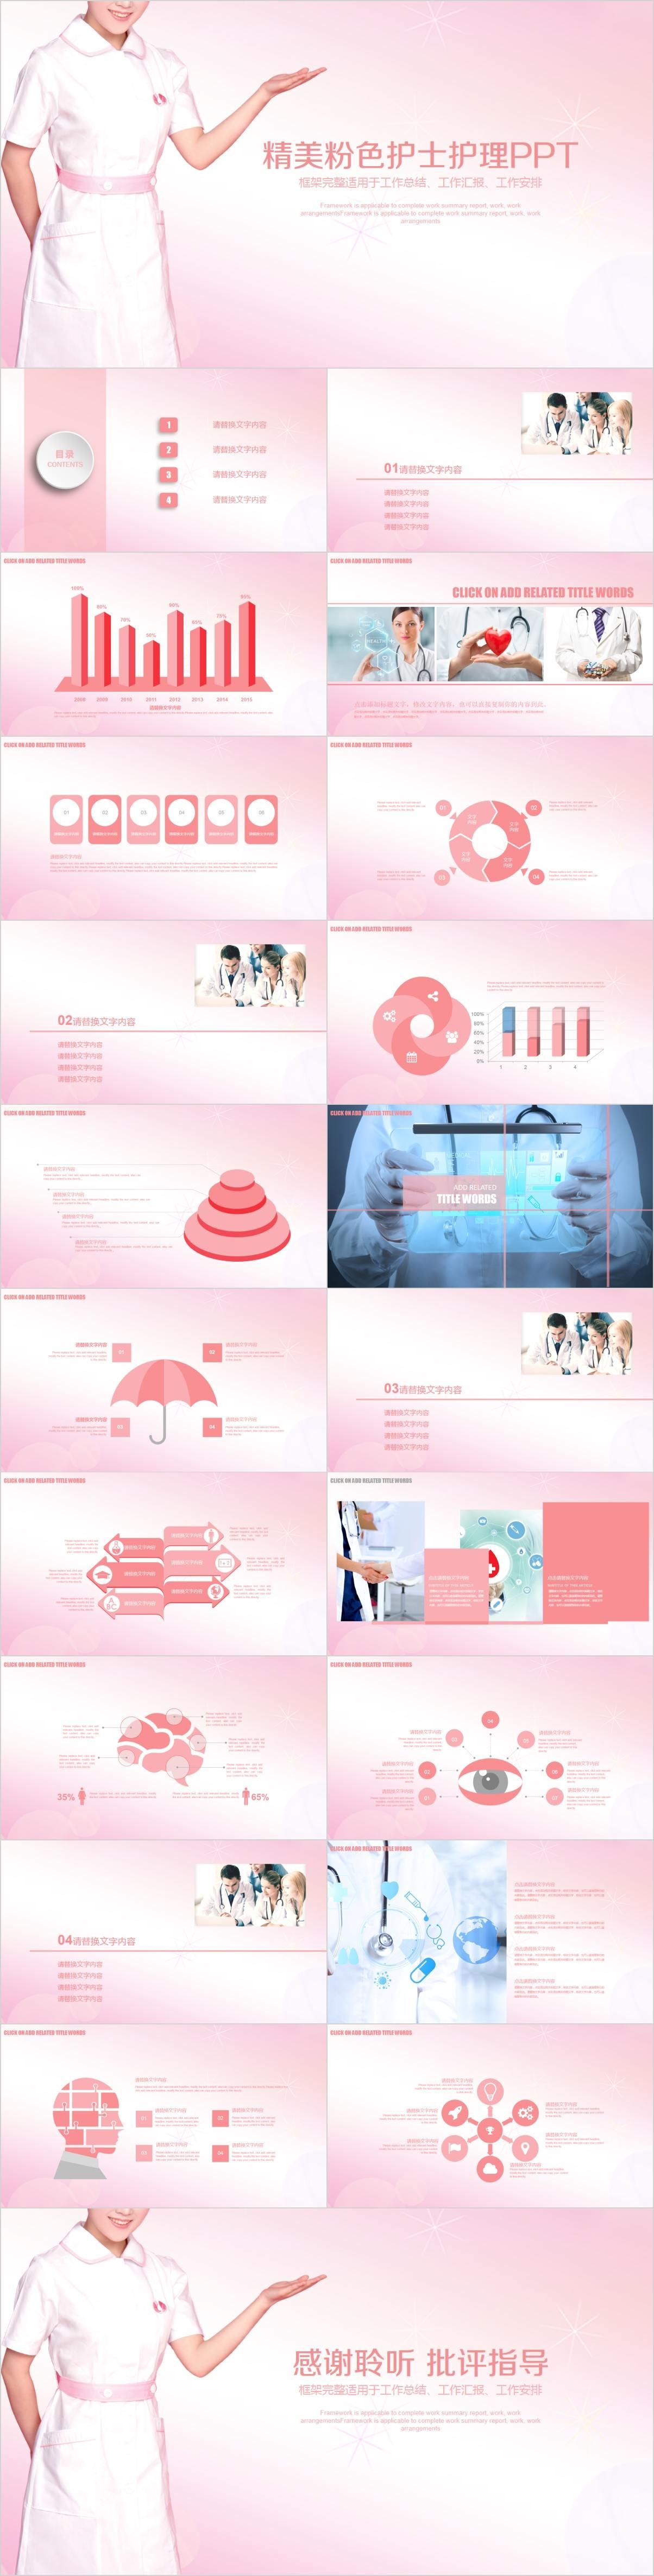 MD0094 精美粉色护士护理PPT模板